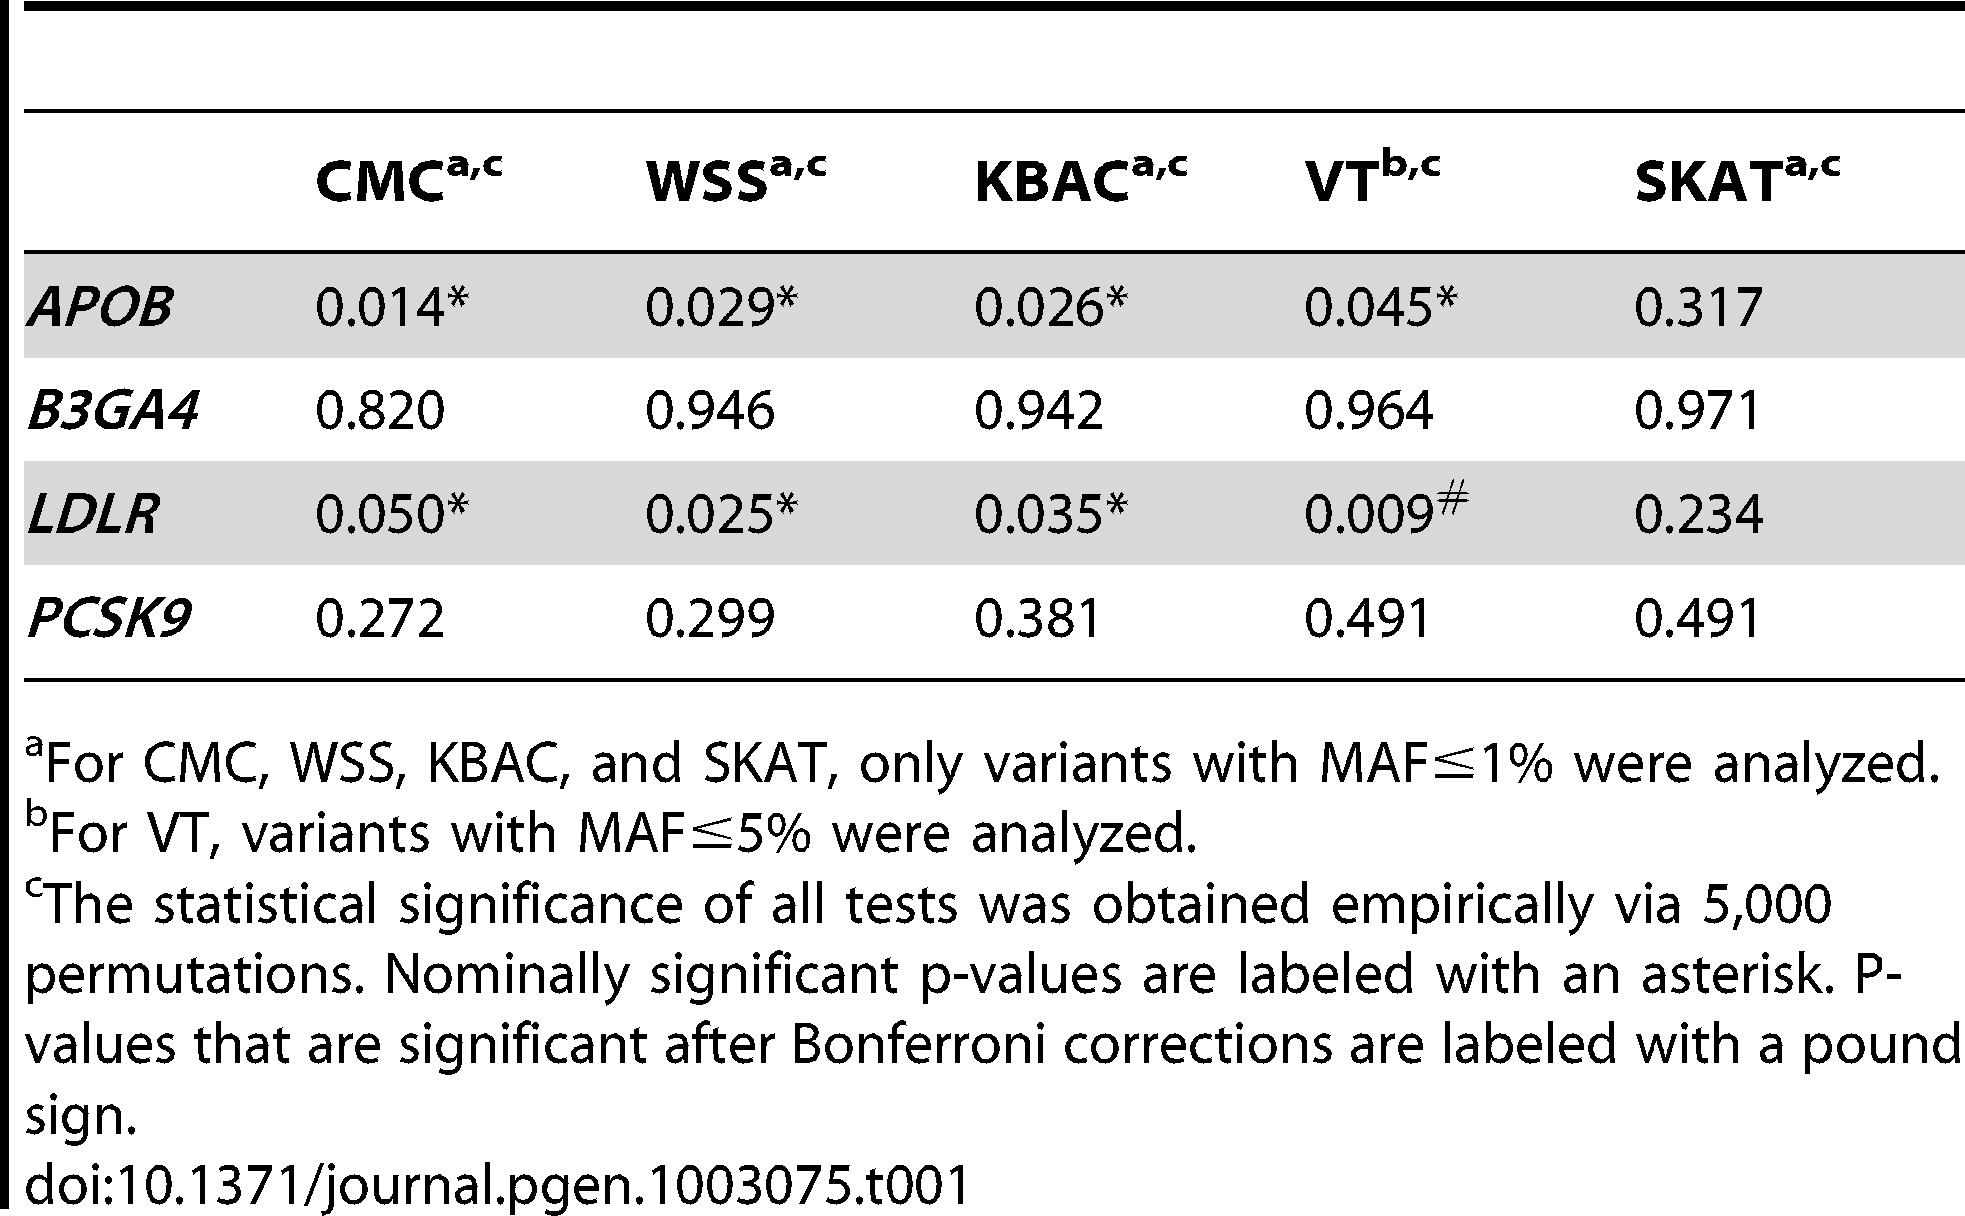 Association Analysis of <i>APOB</i>, <i>B3GA4</i>, <i>LDLR</i>, and <i>PCSK9</i> genes with LDL levels.